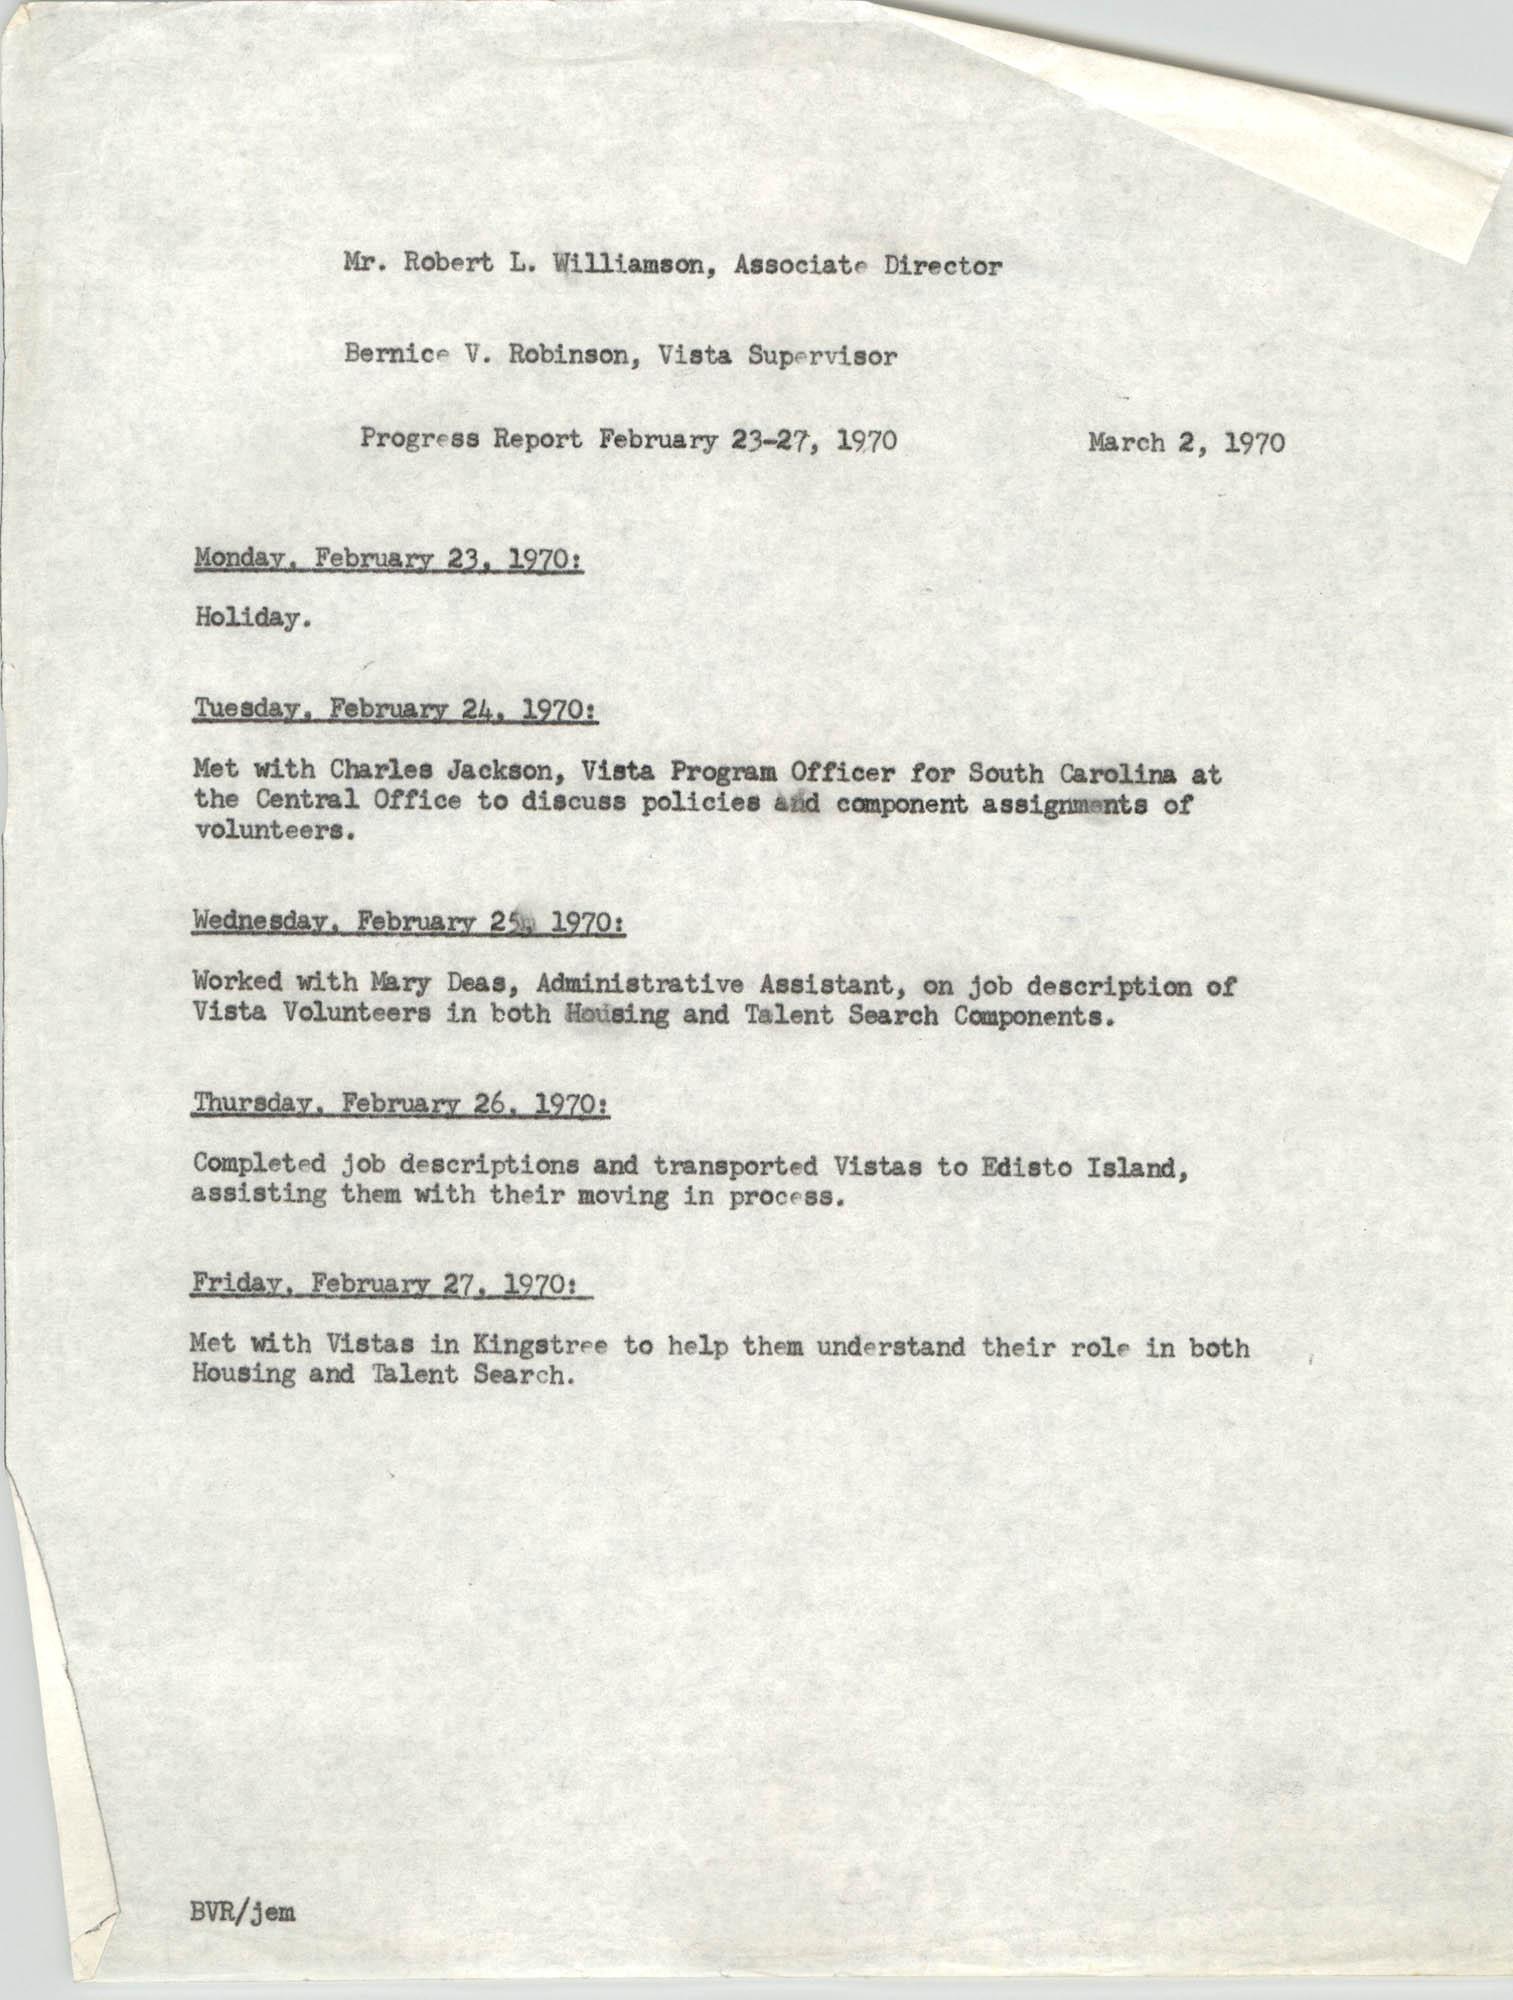 VISTA Progress Report, Week of February 23-27, 1970